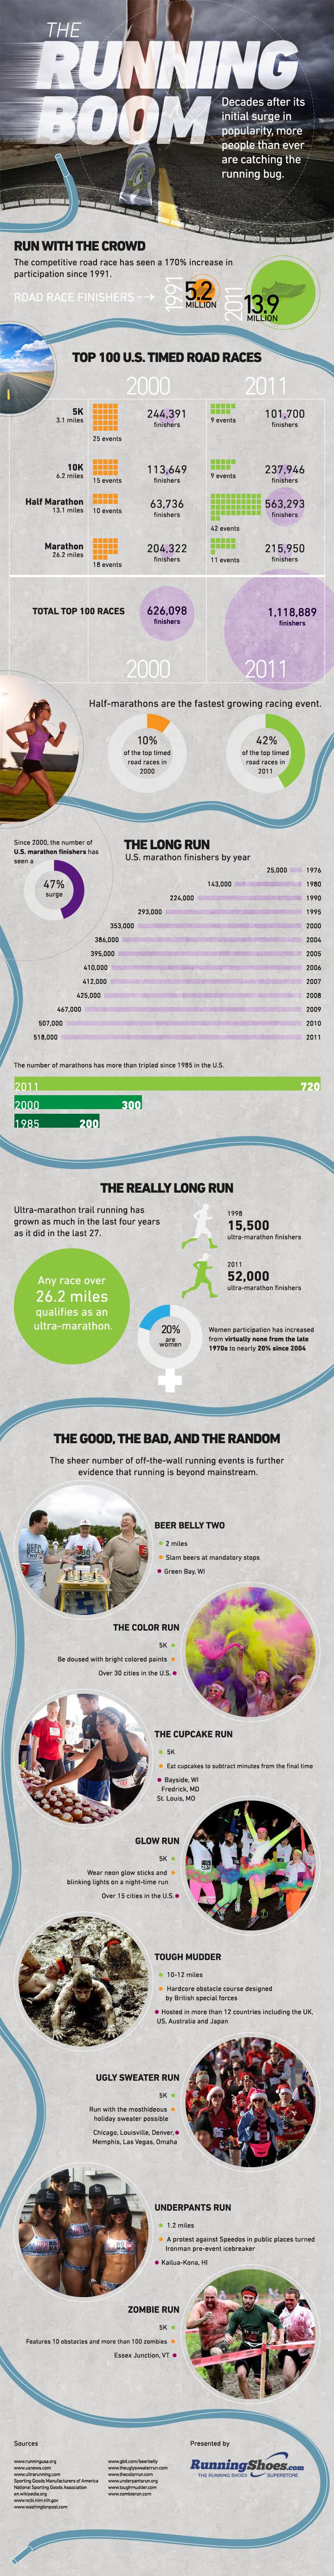 Top Running Marathons